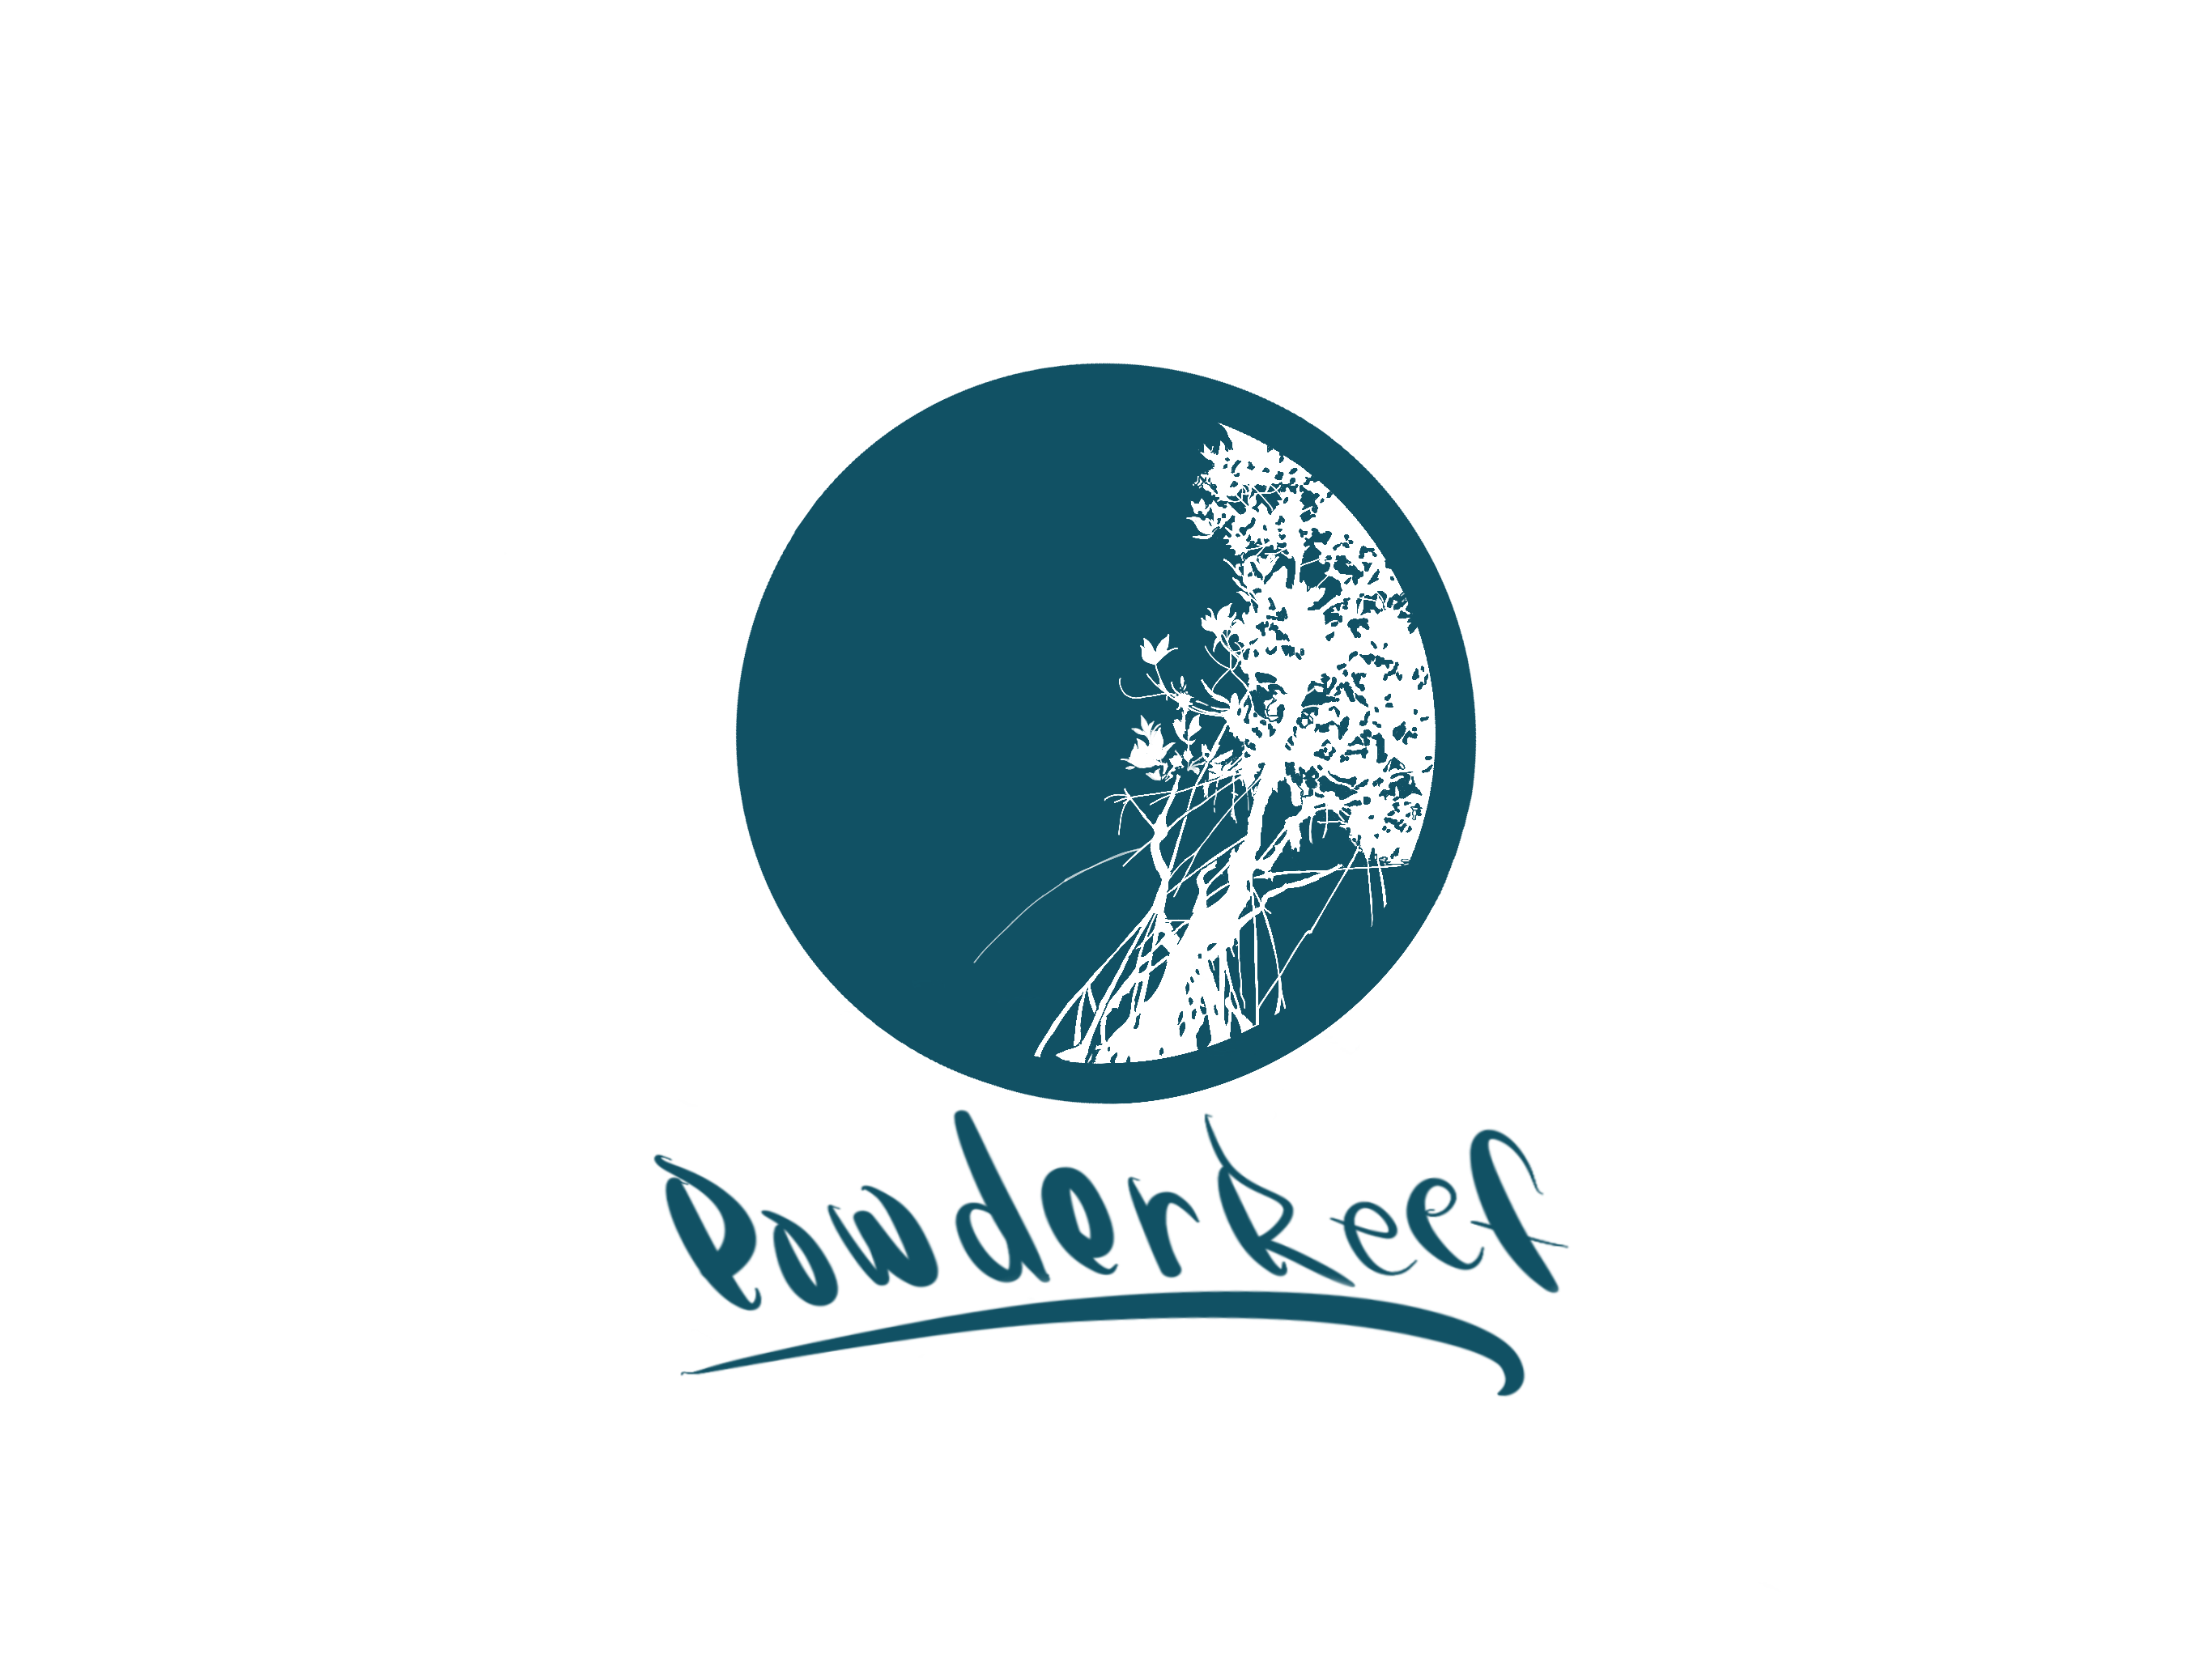 西表島Powder Reef